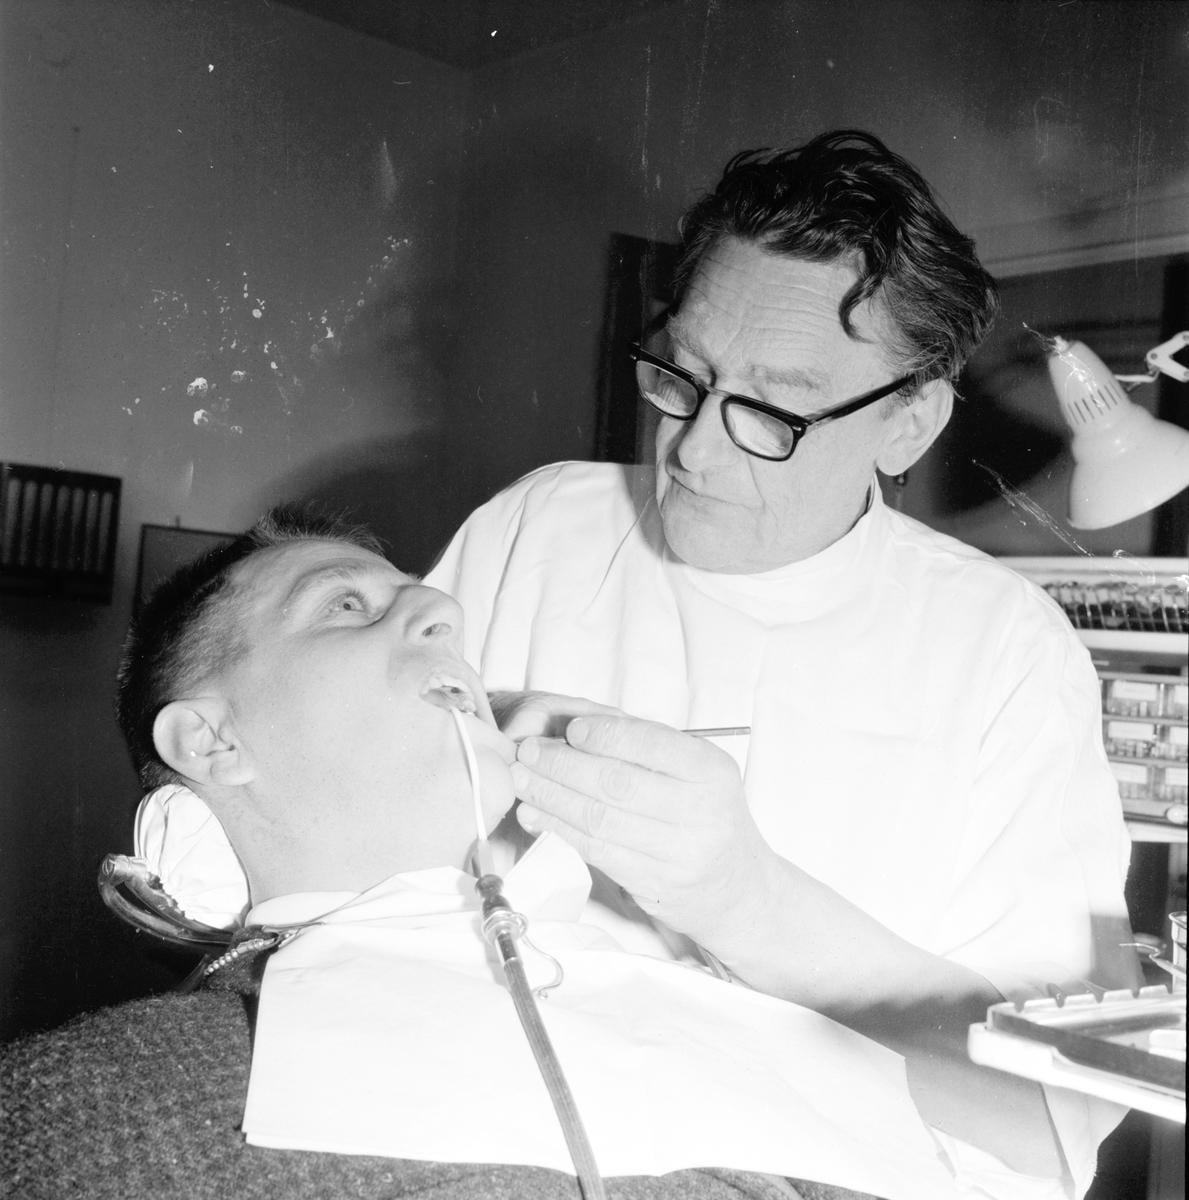 Bergman Erik, Tandläkare, 30 Januari 1965